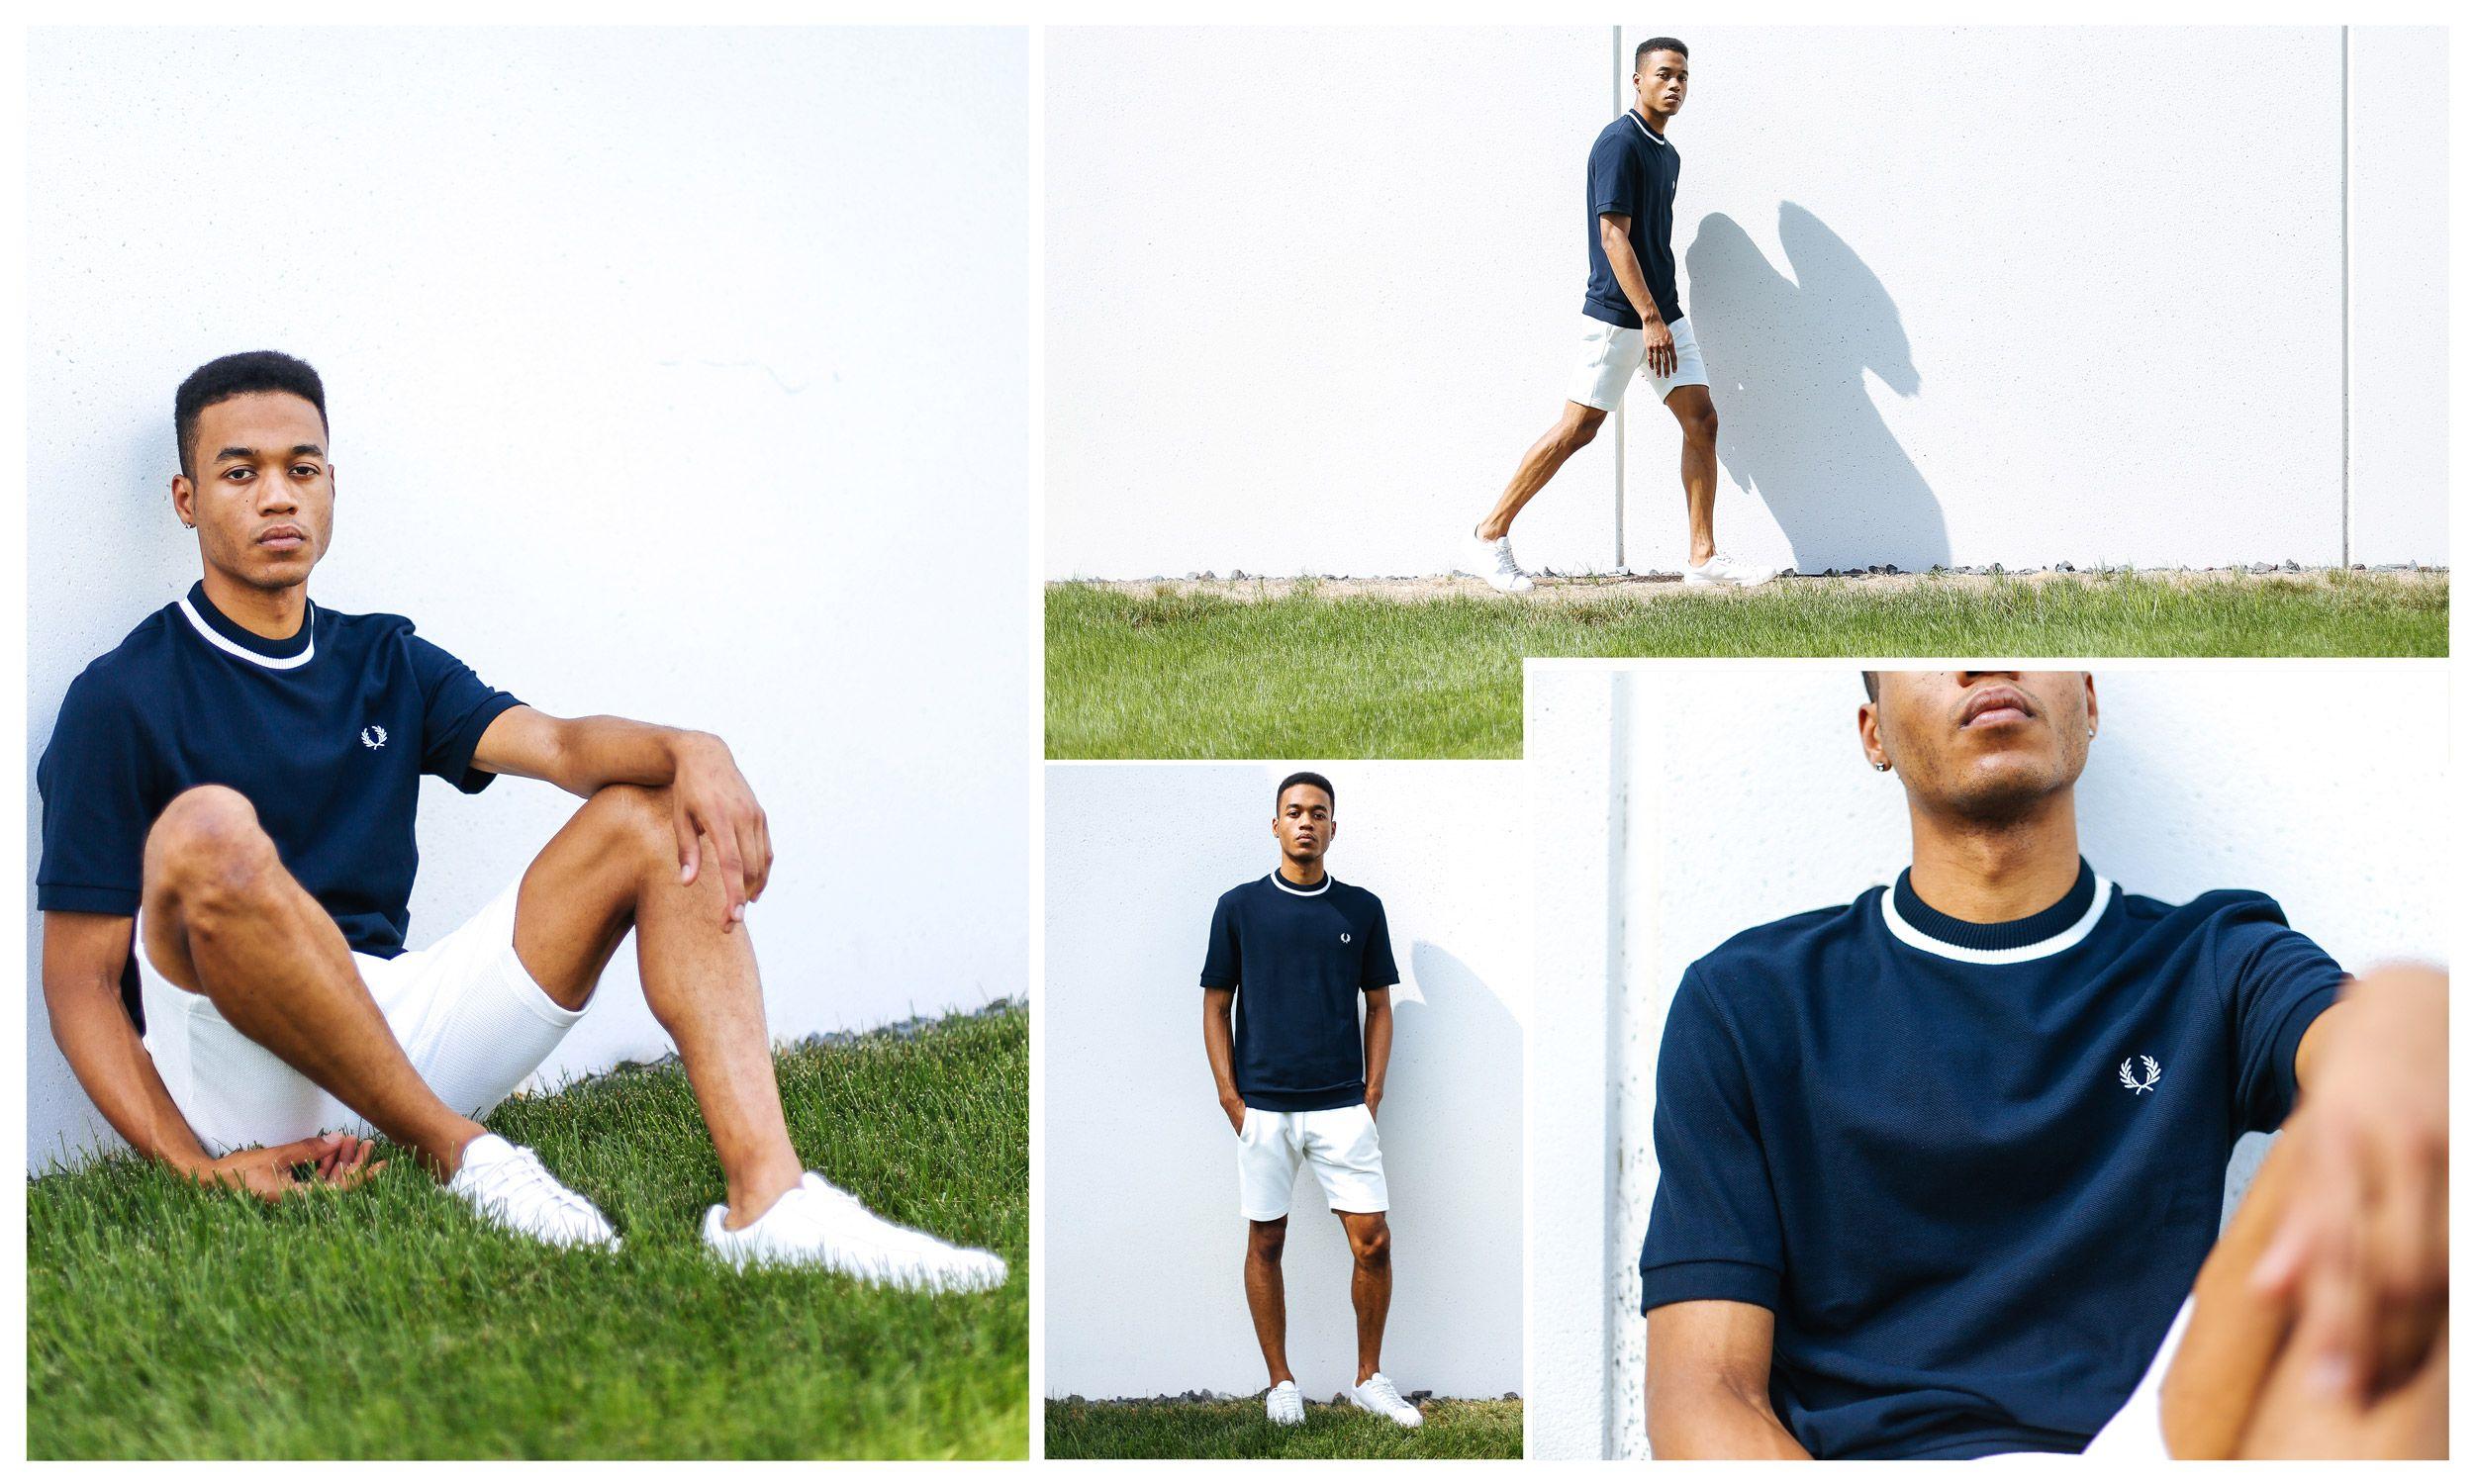 Flannel shirt and shorts men  Fred Perry Woven Shirt ukpinterestuksportoutdoorsmen